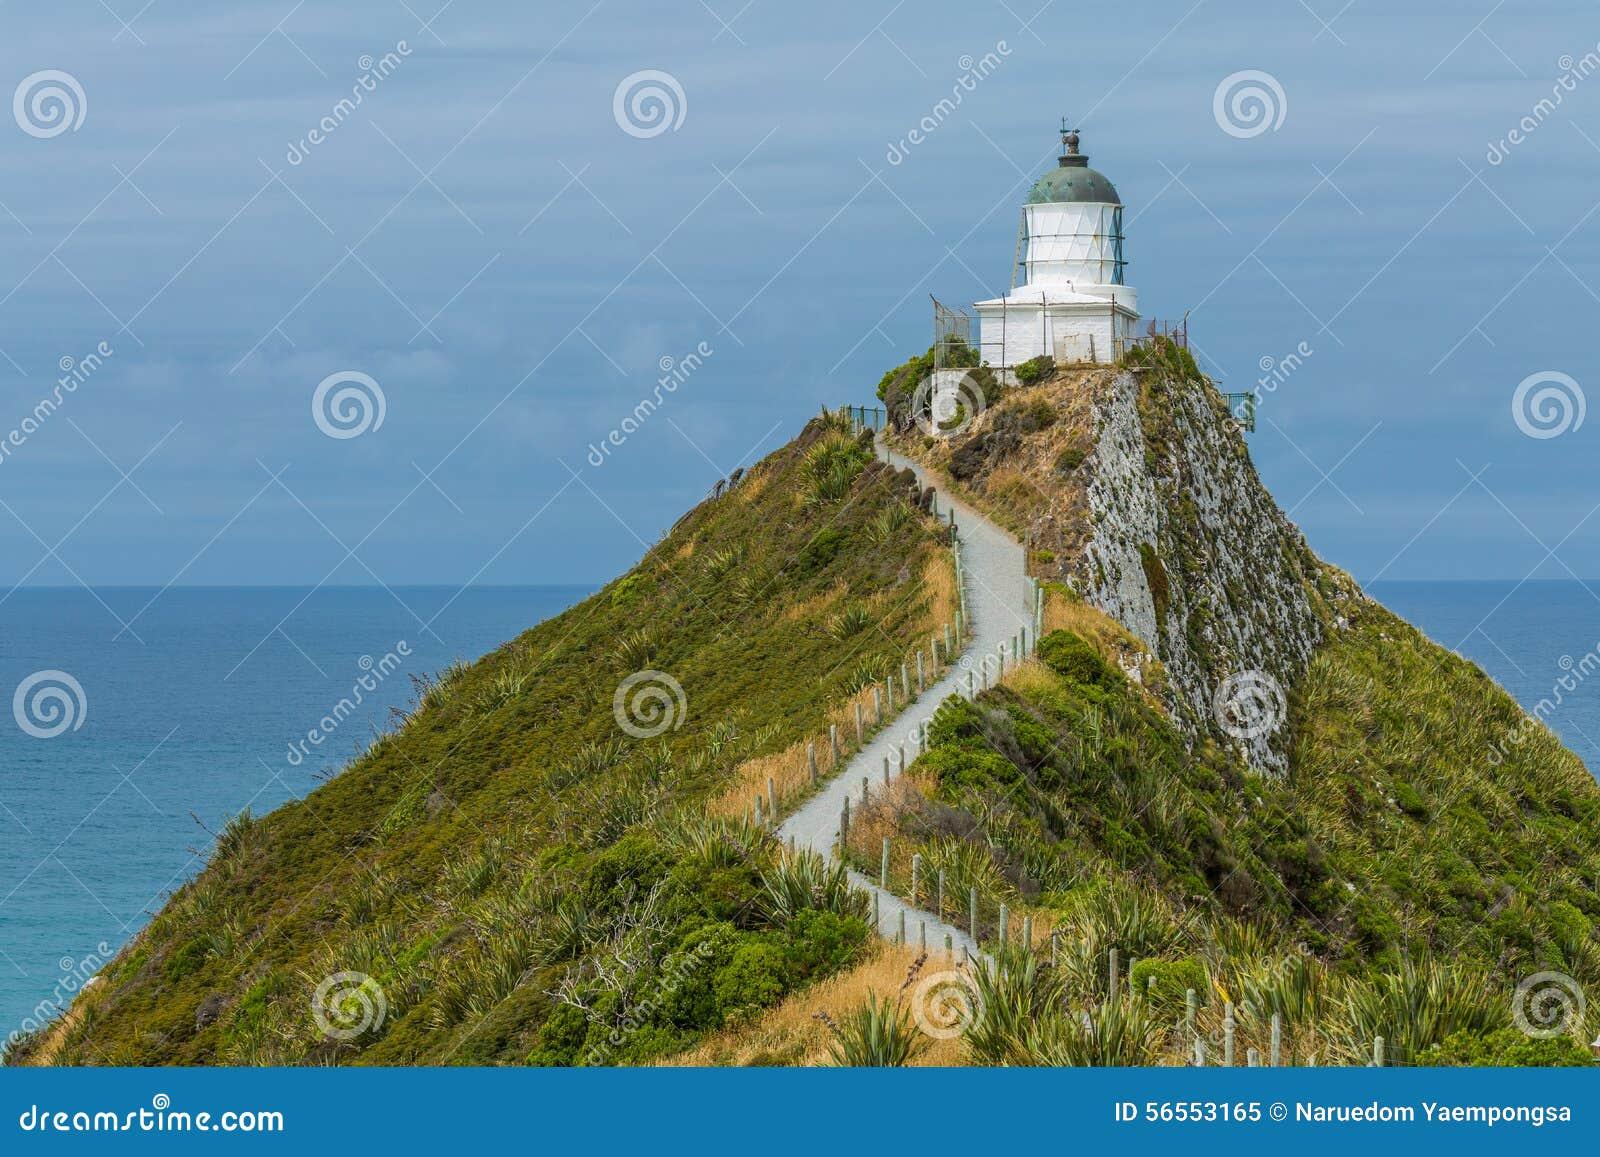 Download Φάρος στο σημείο Νέα Ζηλανδία ψηγμάτων Στοκ Εικόνα - εικόνα από νέος, λόφος: 56553165